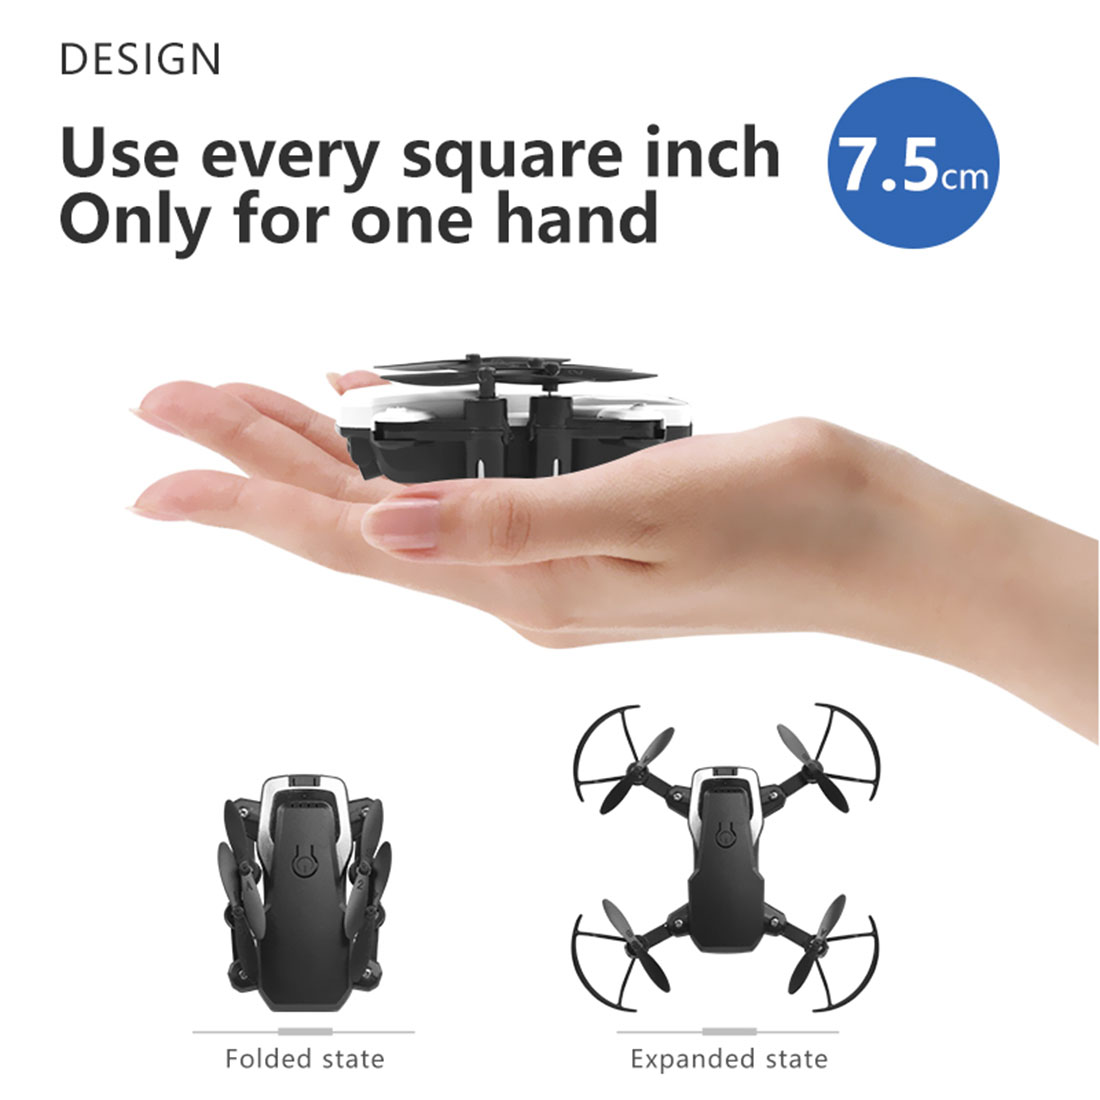 Mini Drohne HD Kamera 0.3MP 2.0MP 5.0MP 4K Hight Halten Modus RC Quadcopter RTF Luft Video WiFi FPV Faltbare hubschrauber 3D Flips